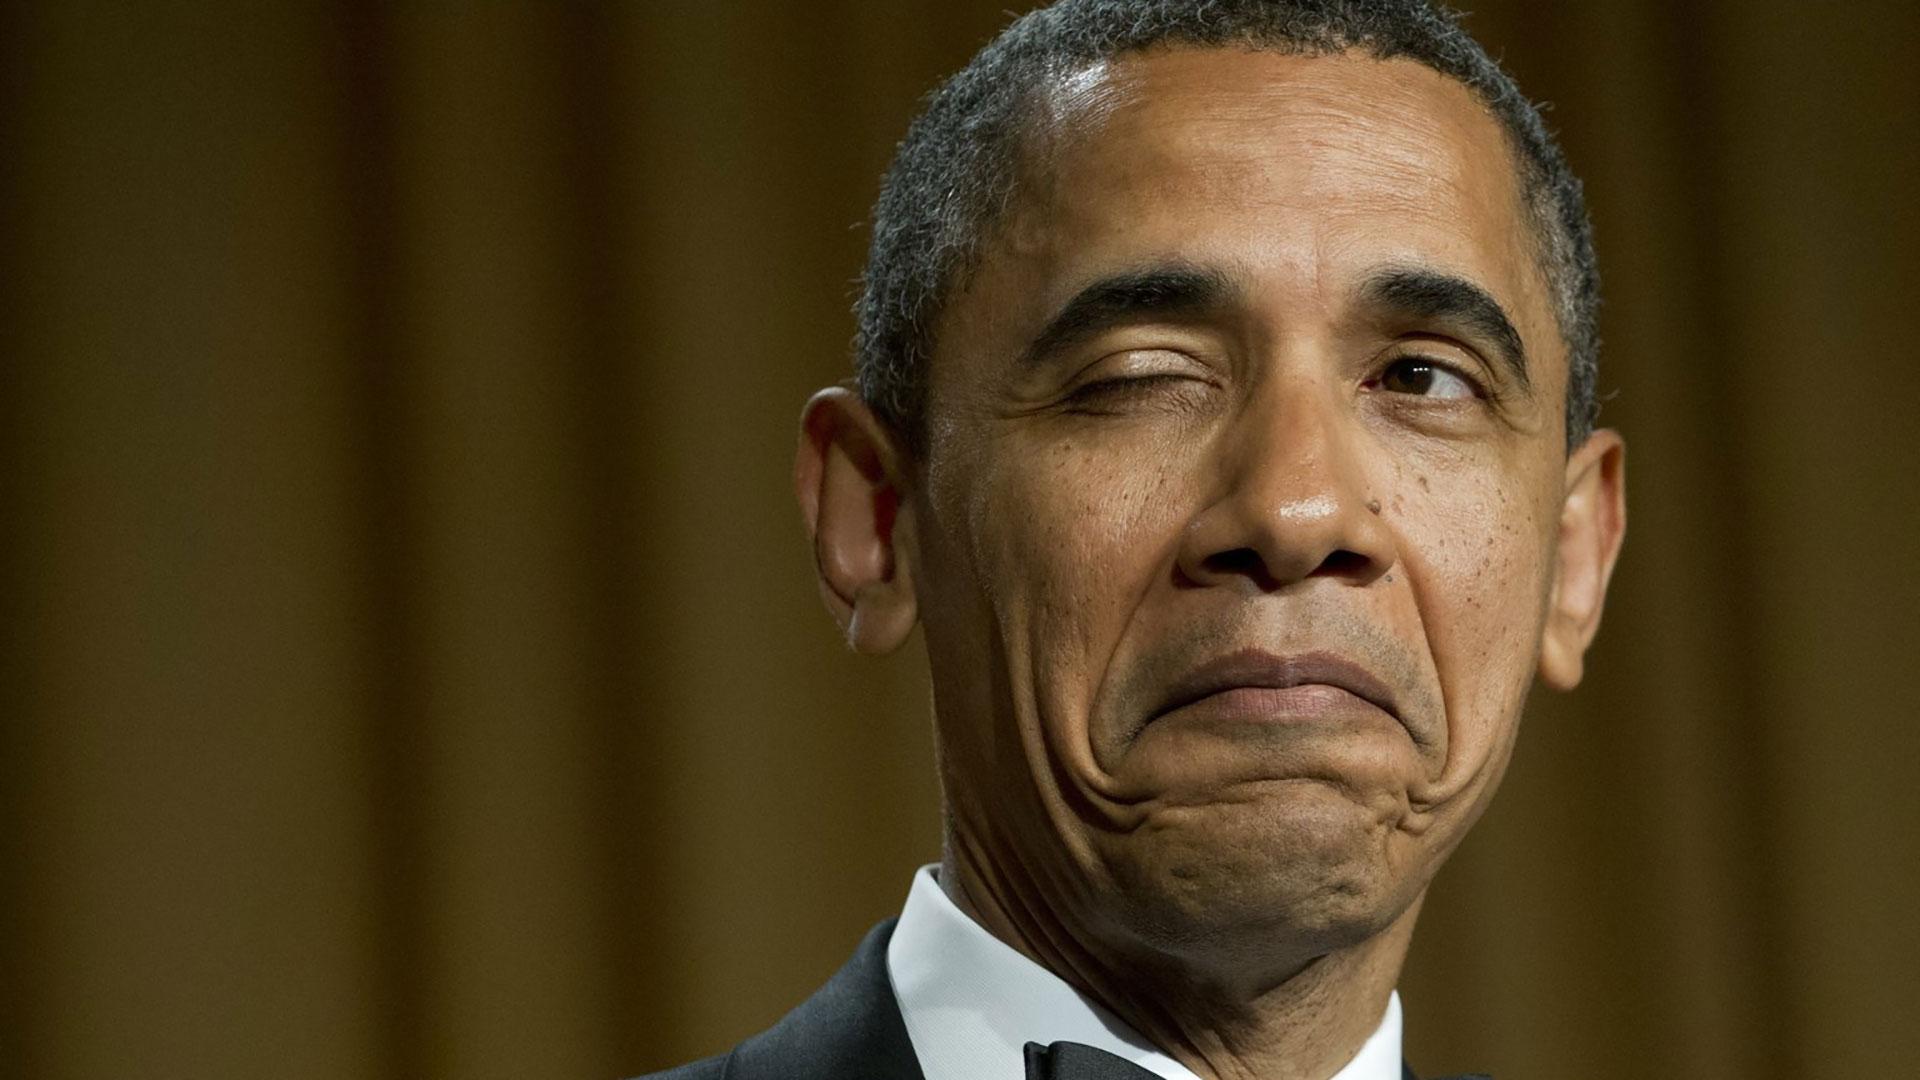 Obama barack obama thinks he's 'pretty good' at memes sick chirpse